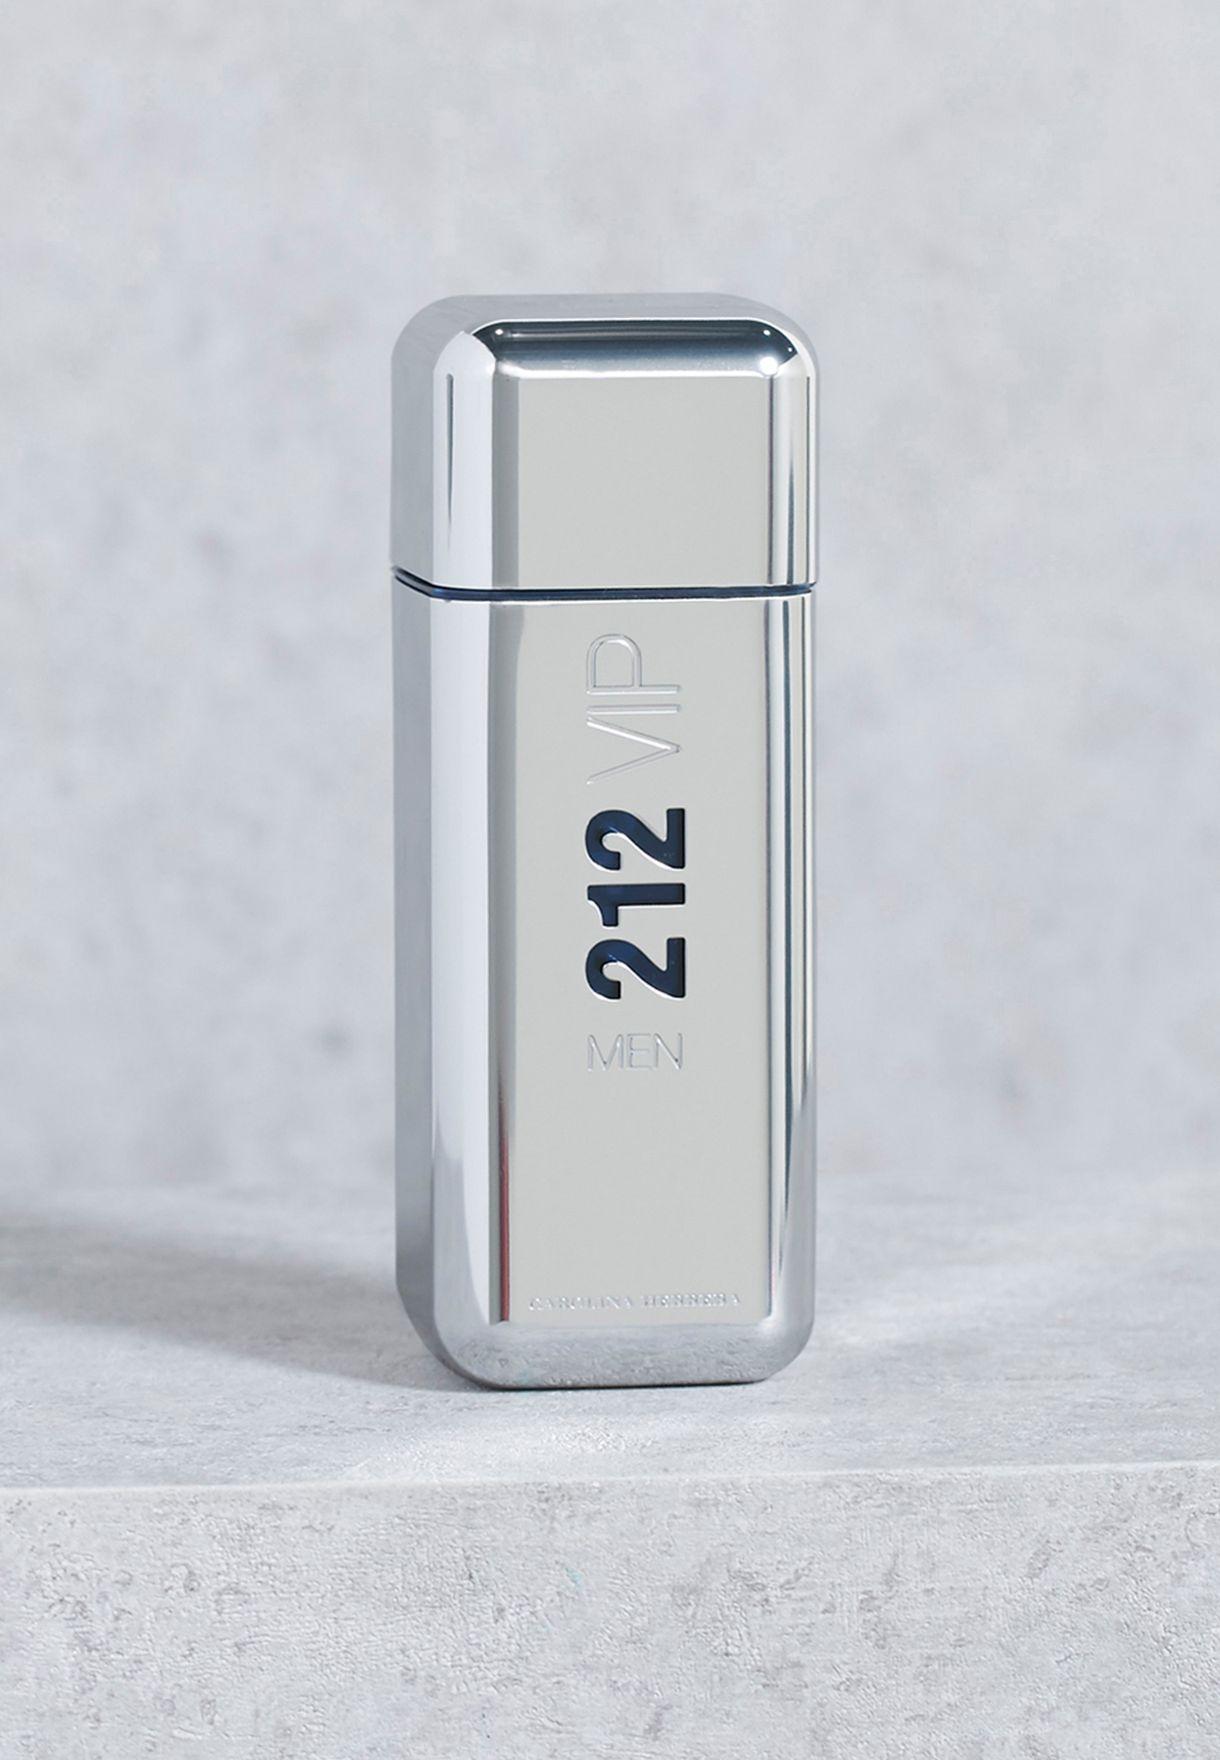 5dd684d1e تسوق عطر 212 في اي بي للرجال 100 مل ماركة كارولينا هيريرا لون شفاف ...